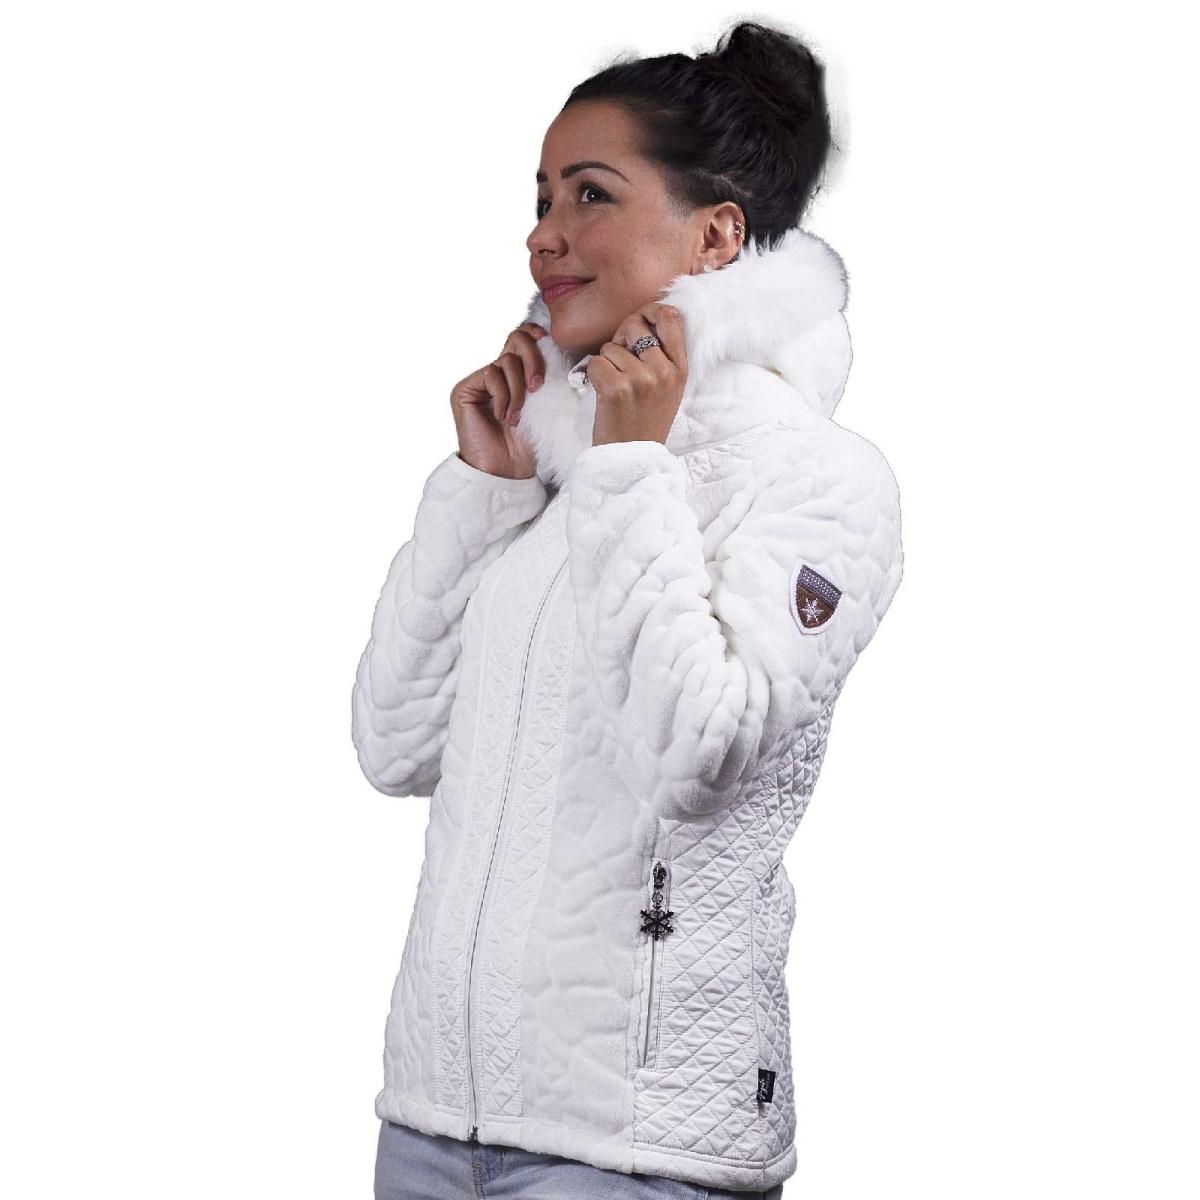 veste polaire femme vienne capuche blanc angele sportswear